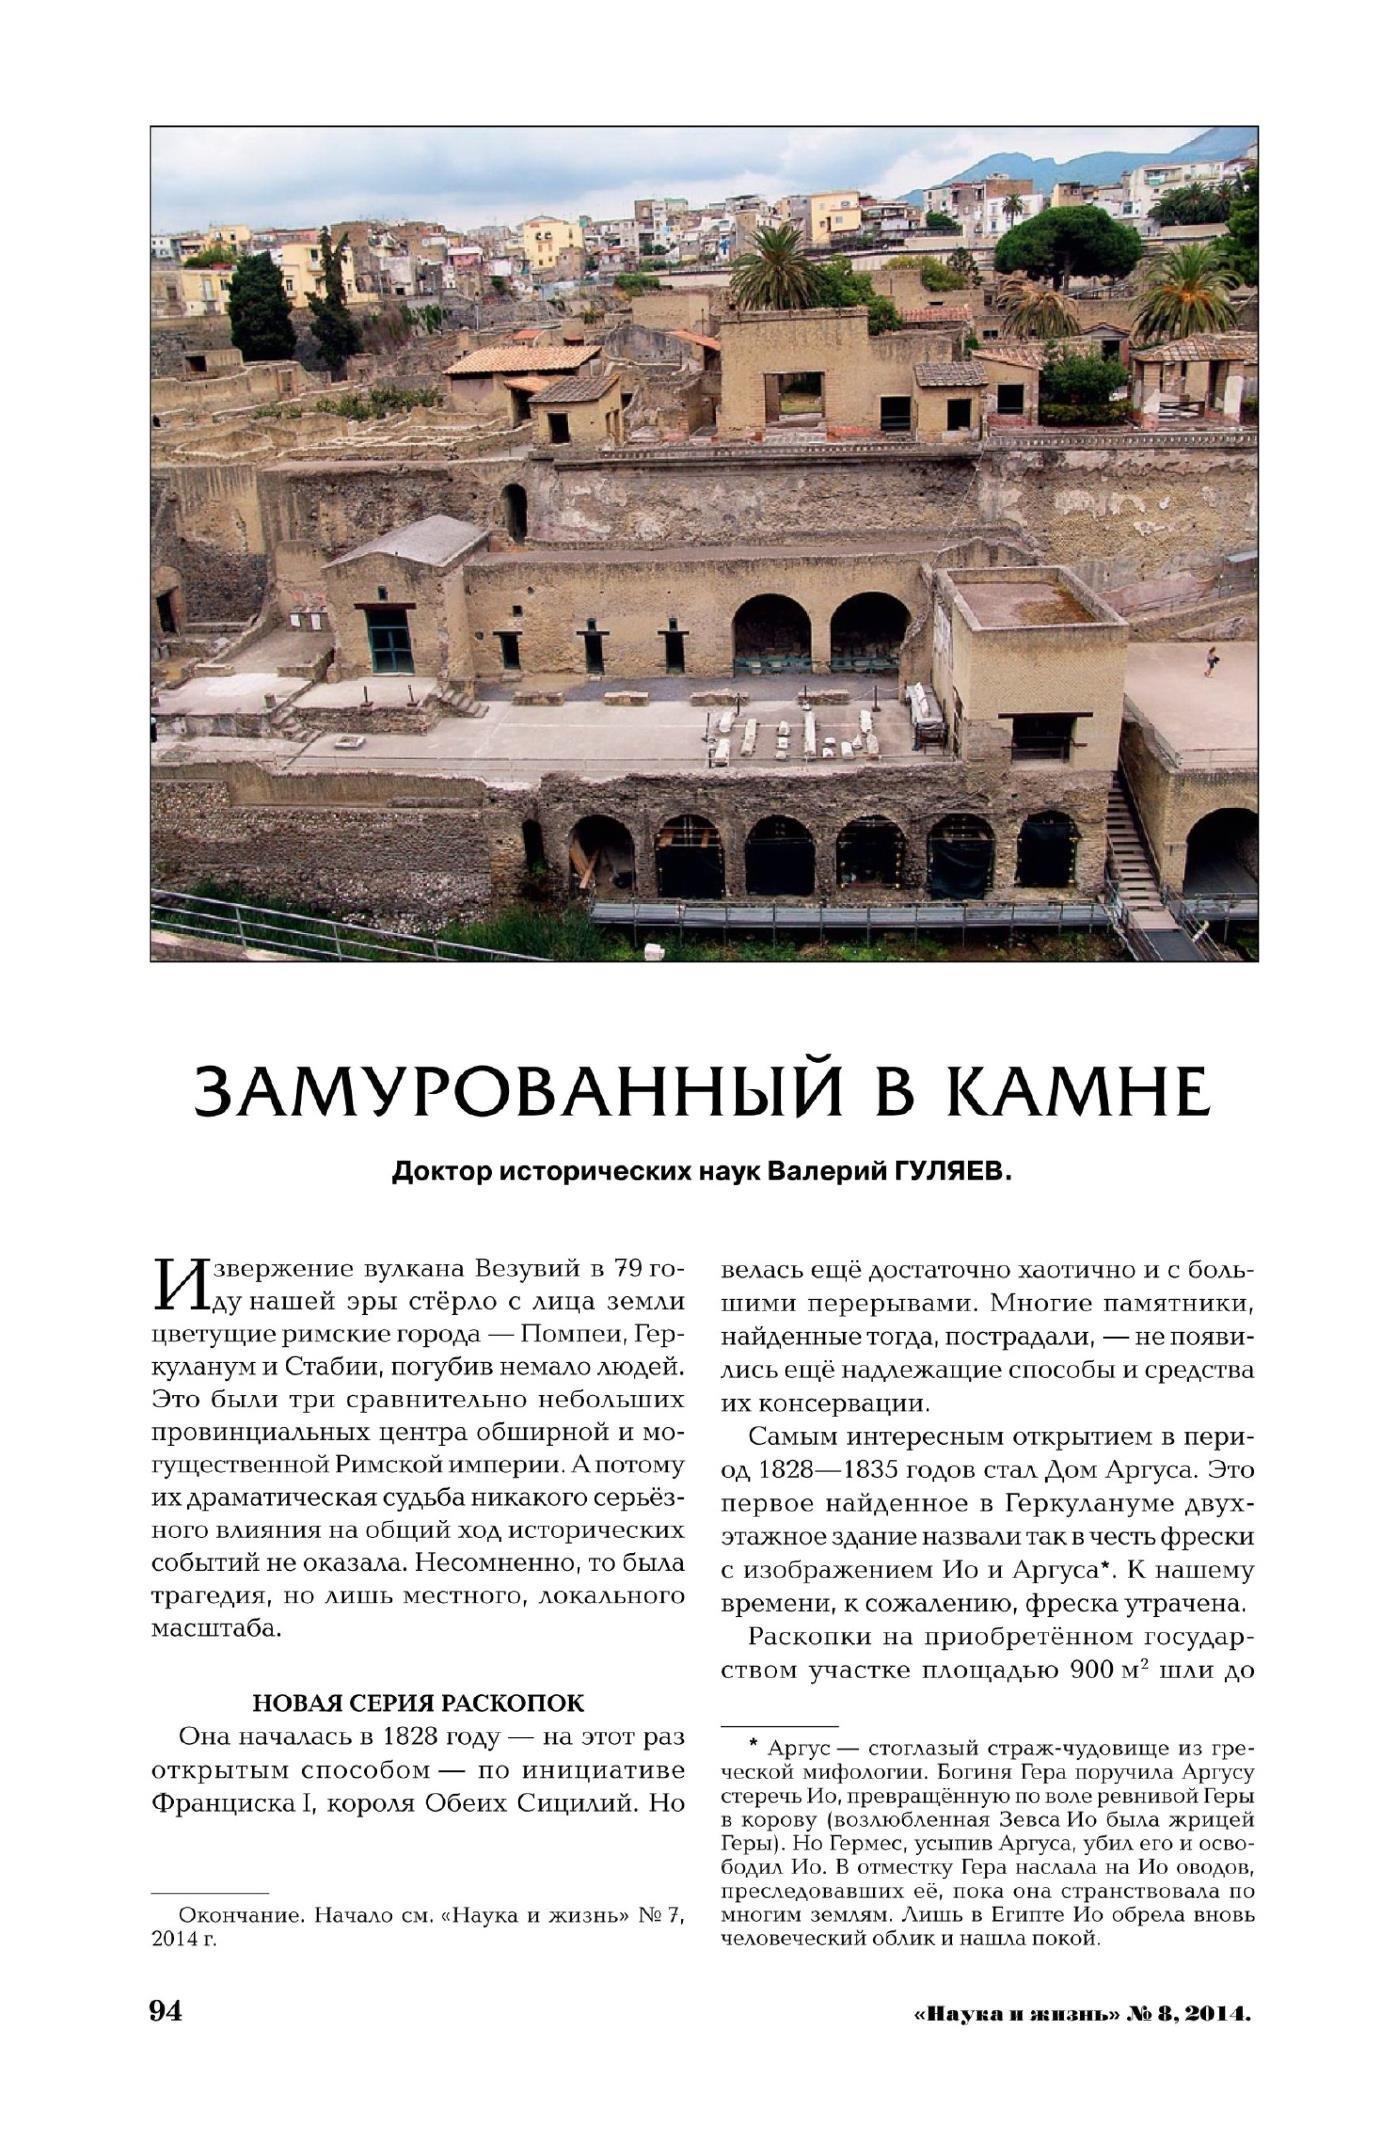 http://images.vfl.ru/ii/1407271103/1efc4470/5909385.jpg